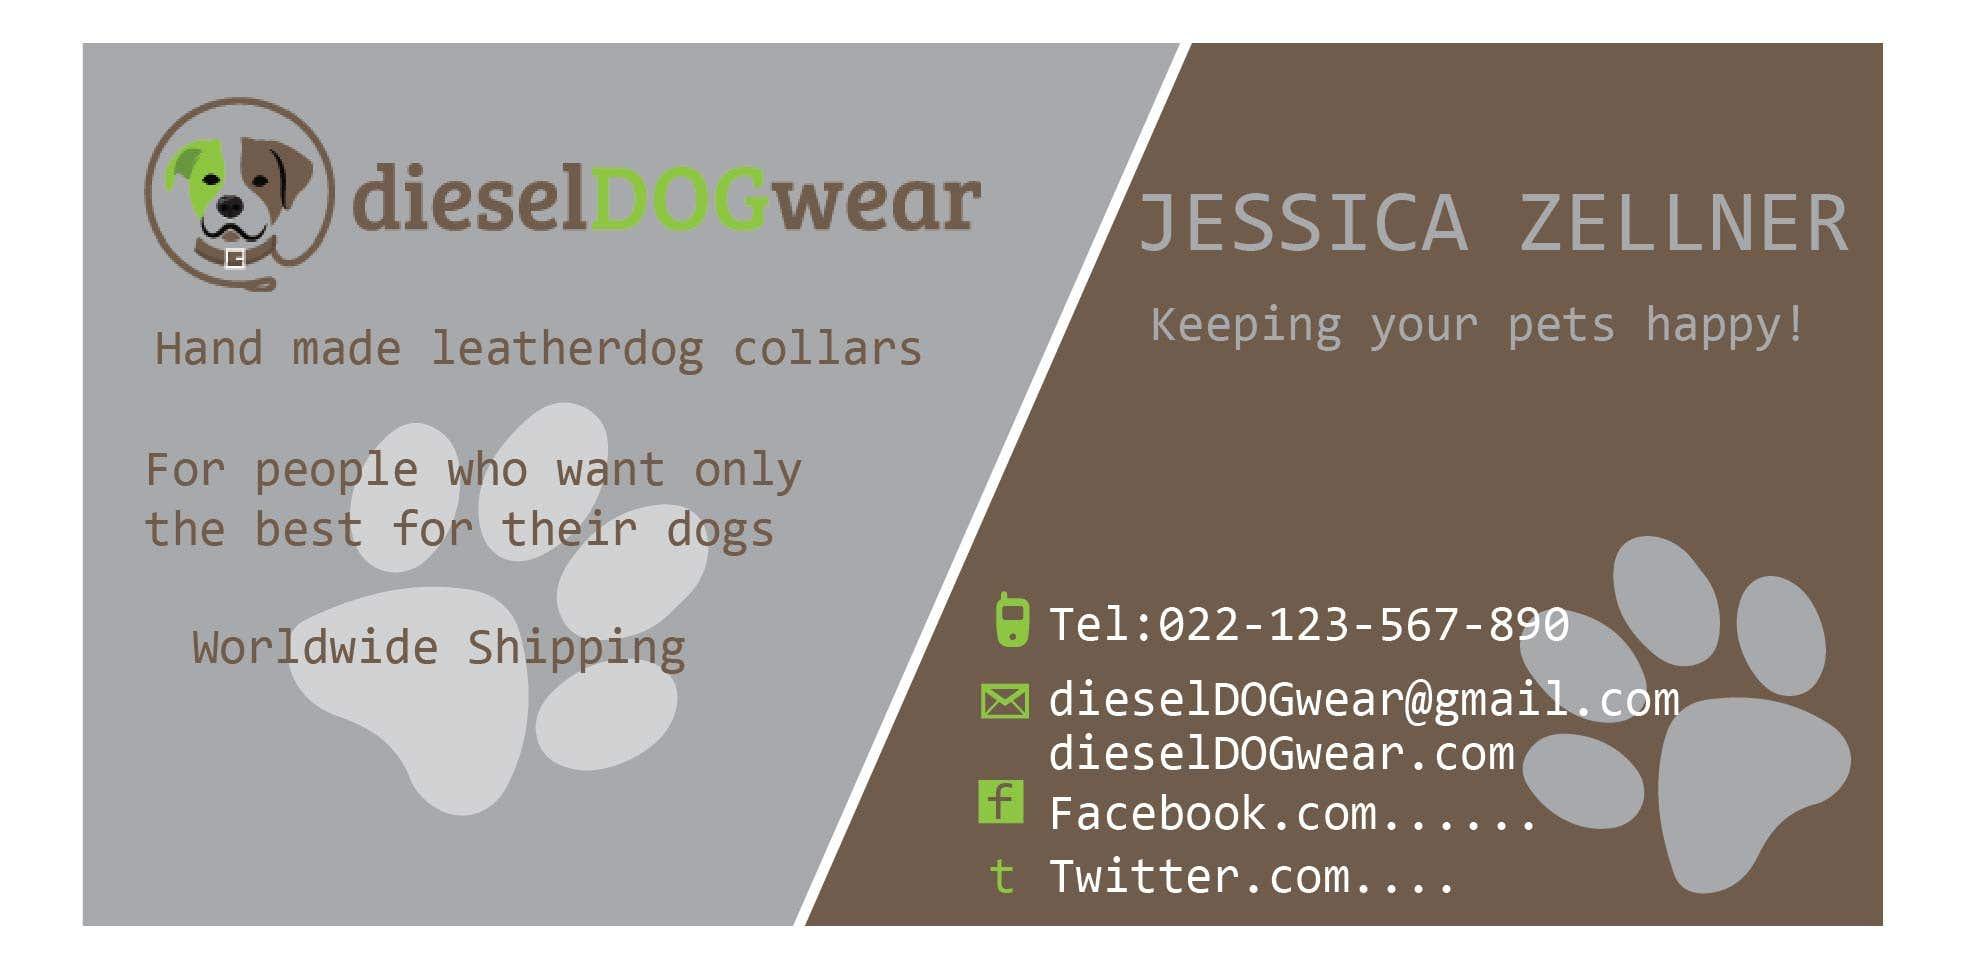 Diesel Dog Wear - Business Card